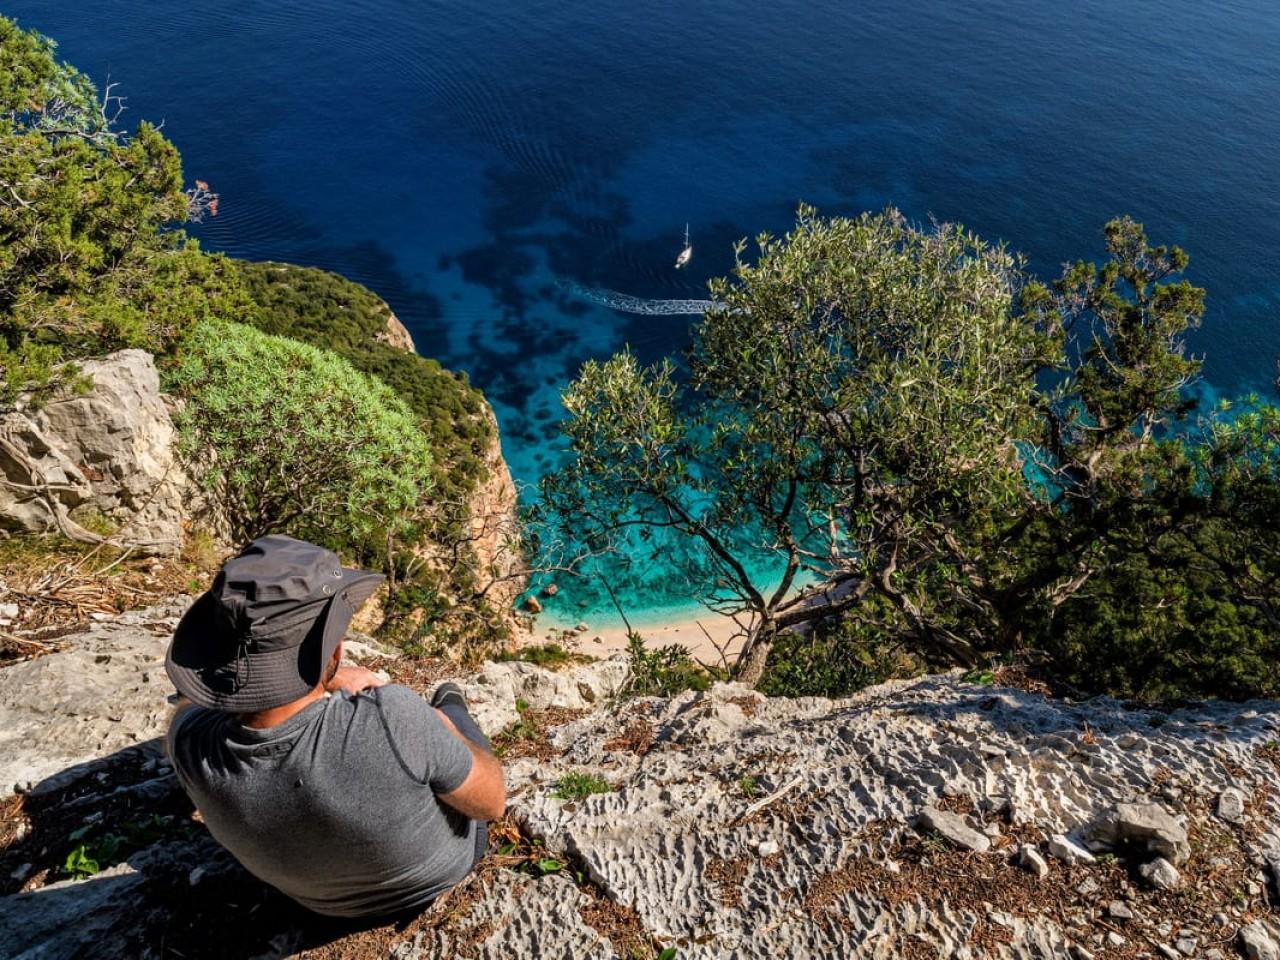 Trekking in Sardegna: